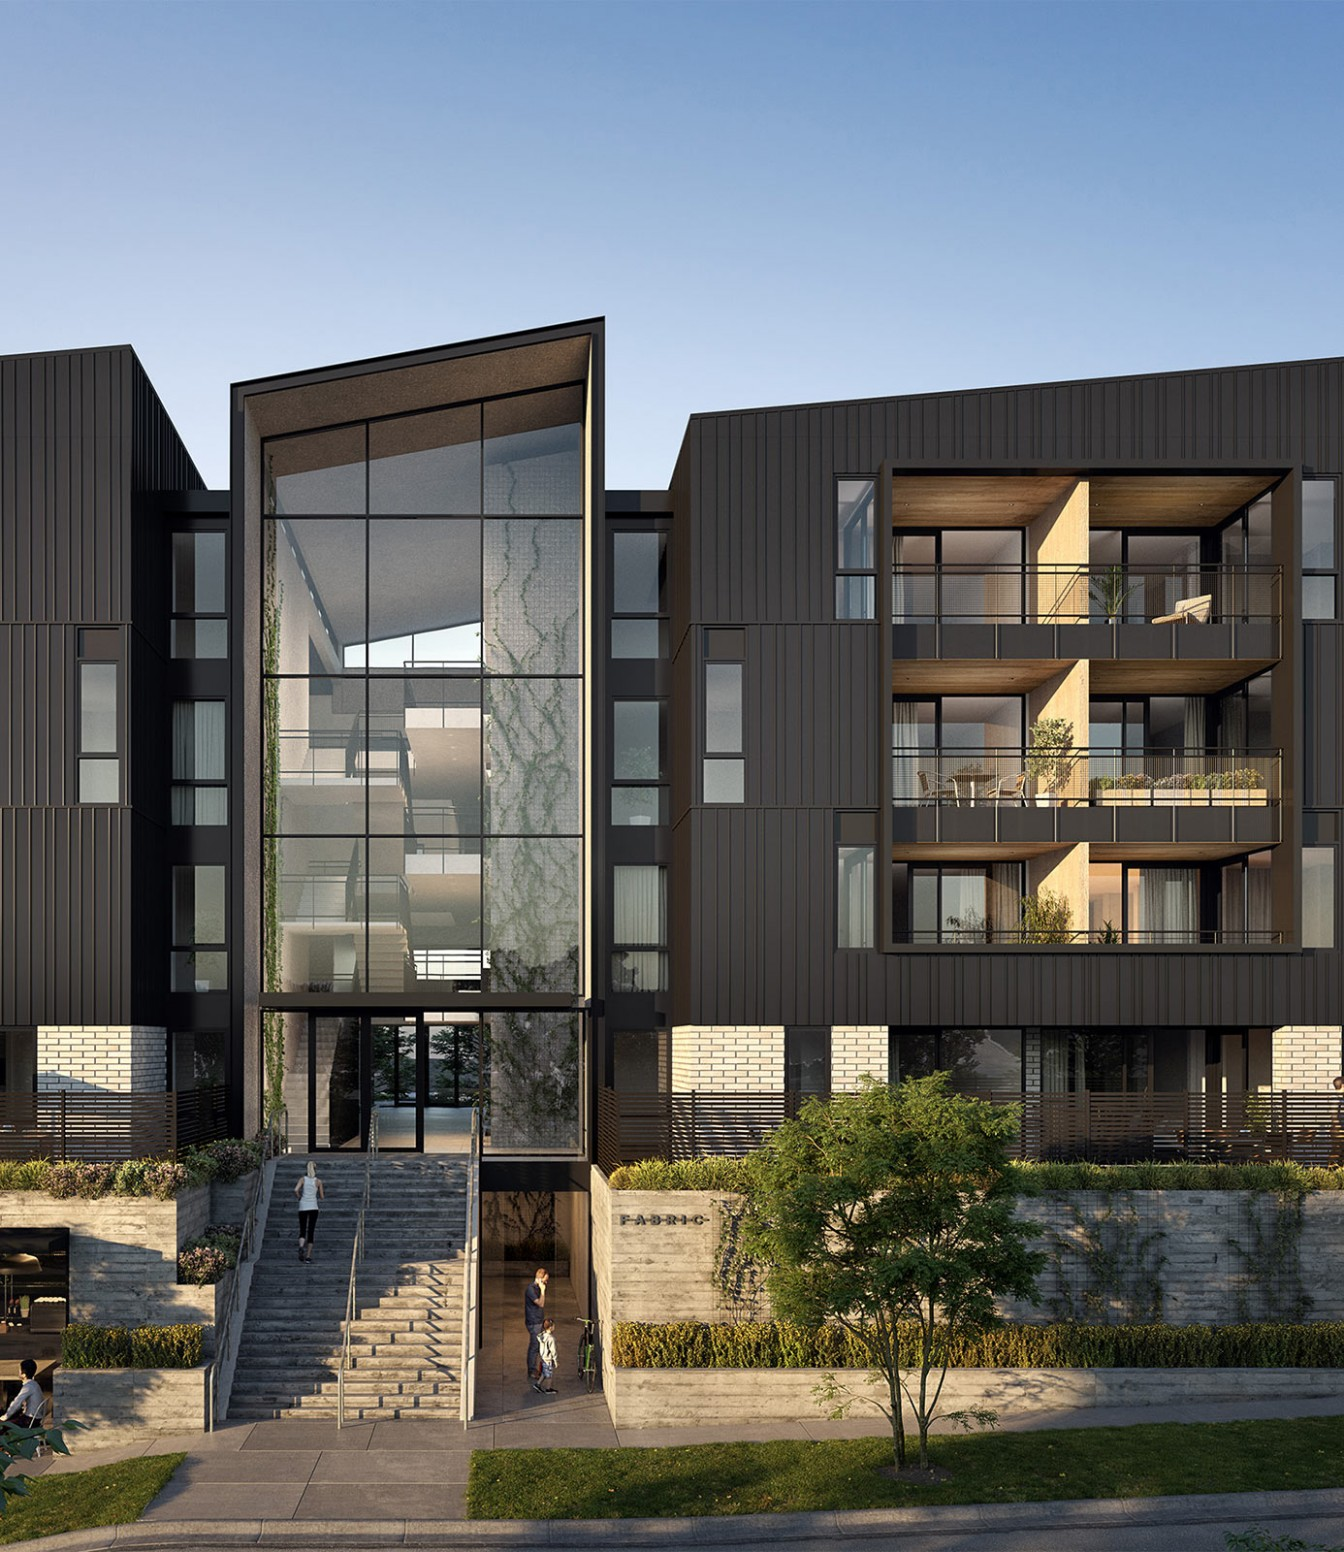 F-A-B-R-I-C- - Apartment Design Nz